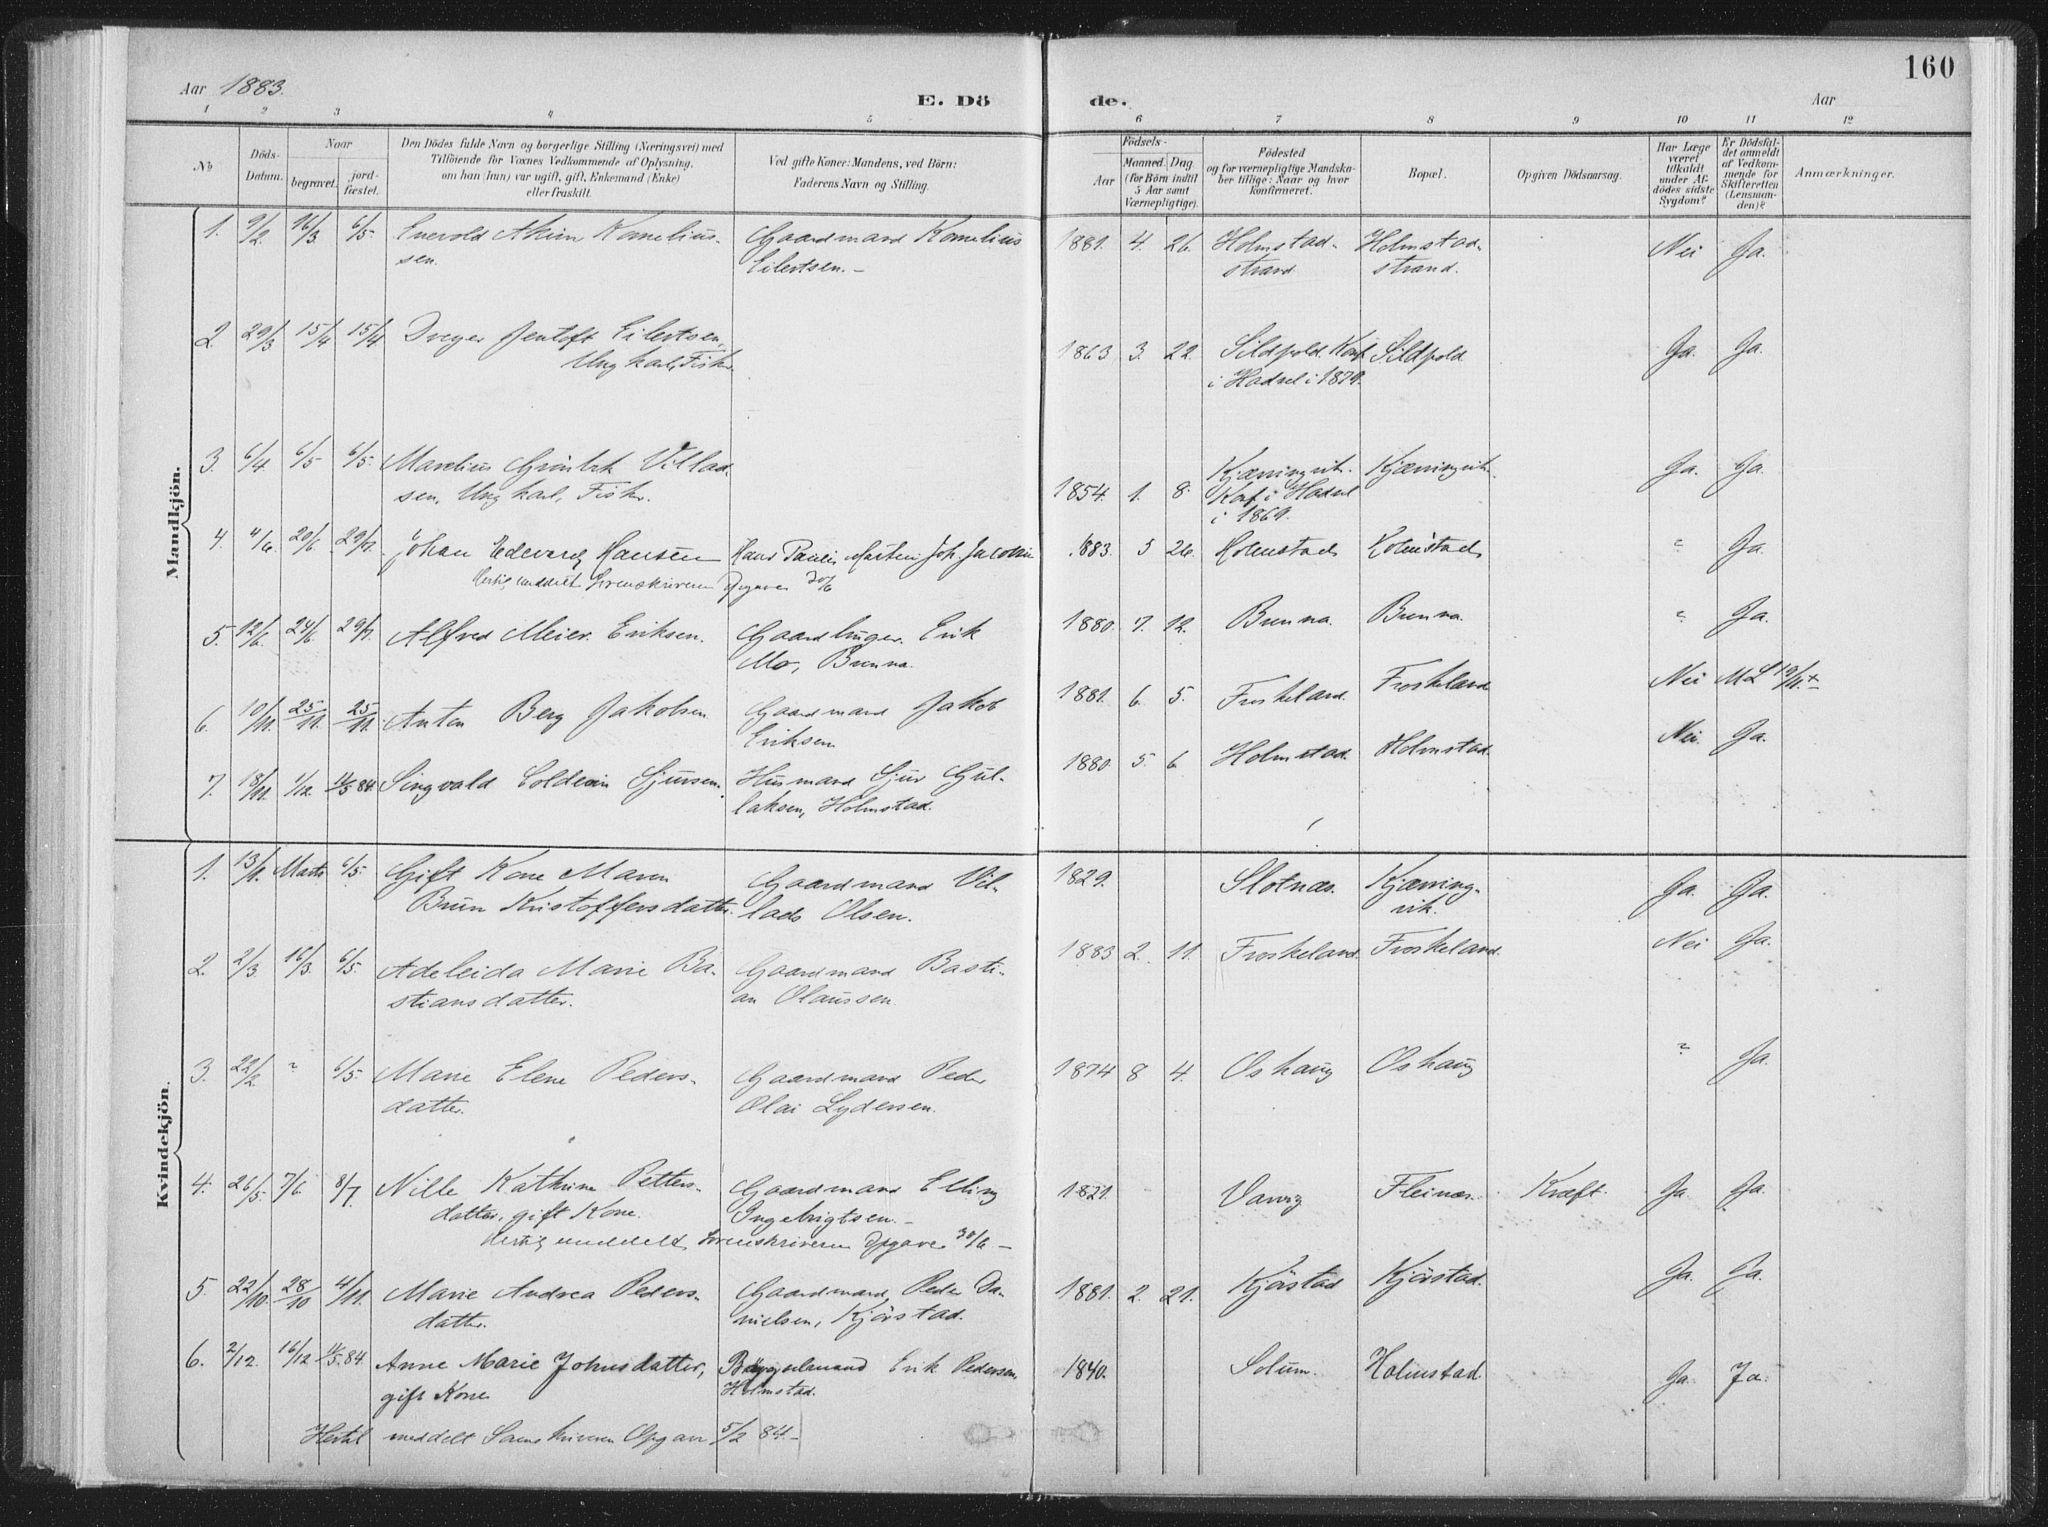 SAT, Ministerialprotokoller, klokkerbøker og fødselsregistre - Nordland, 890/L1286: Ministerialbok nr. 890A01, 1882-1902, s. 160